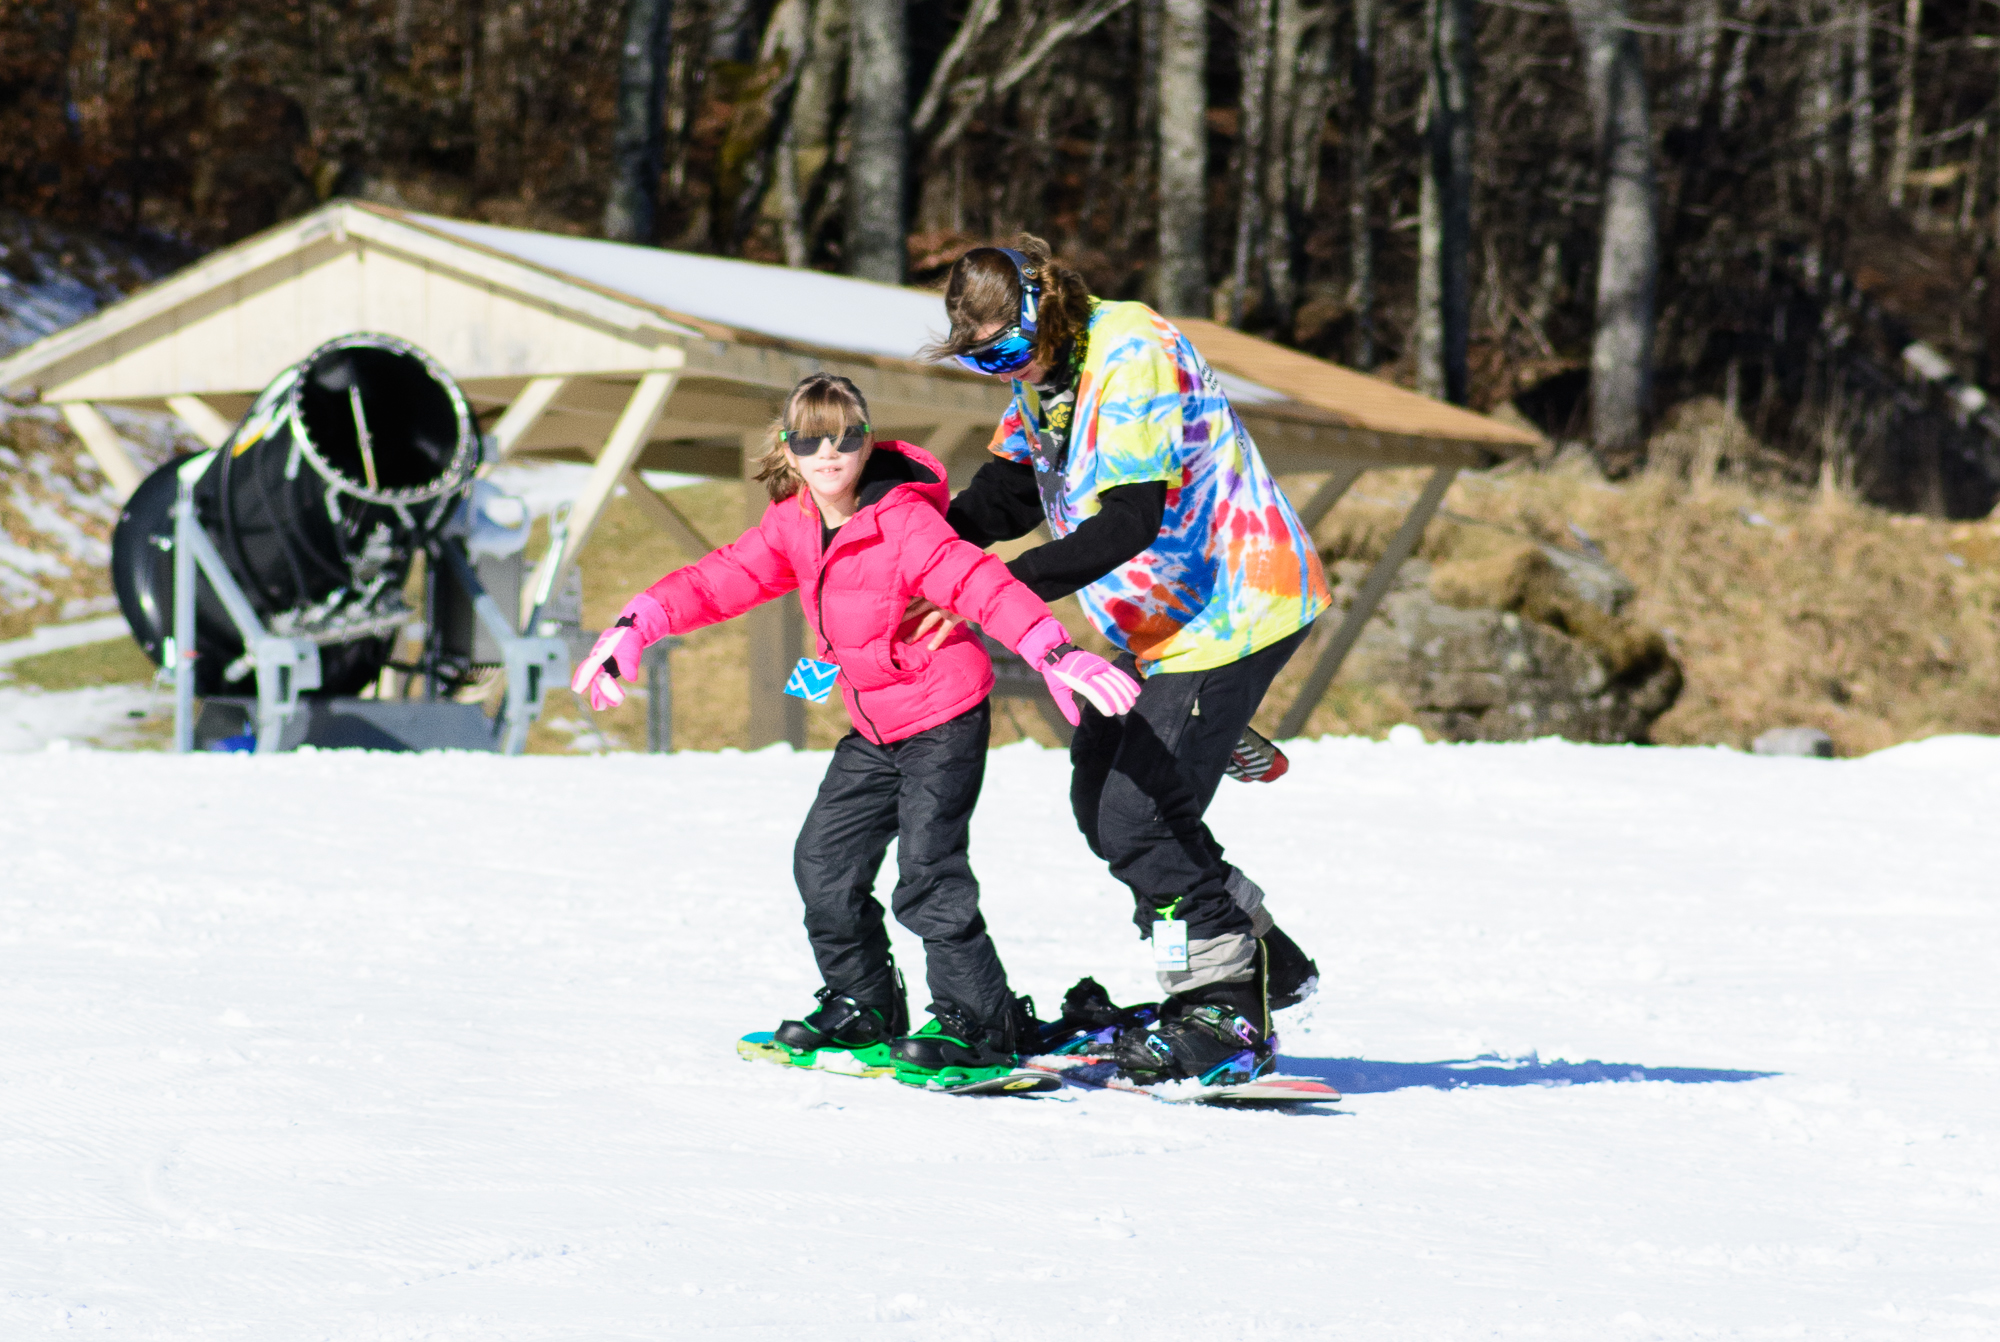 Ski Lessons at Beech Mountain Resort